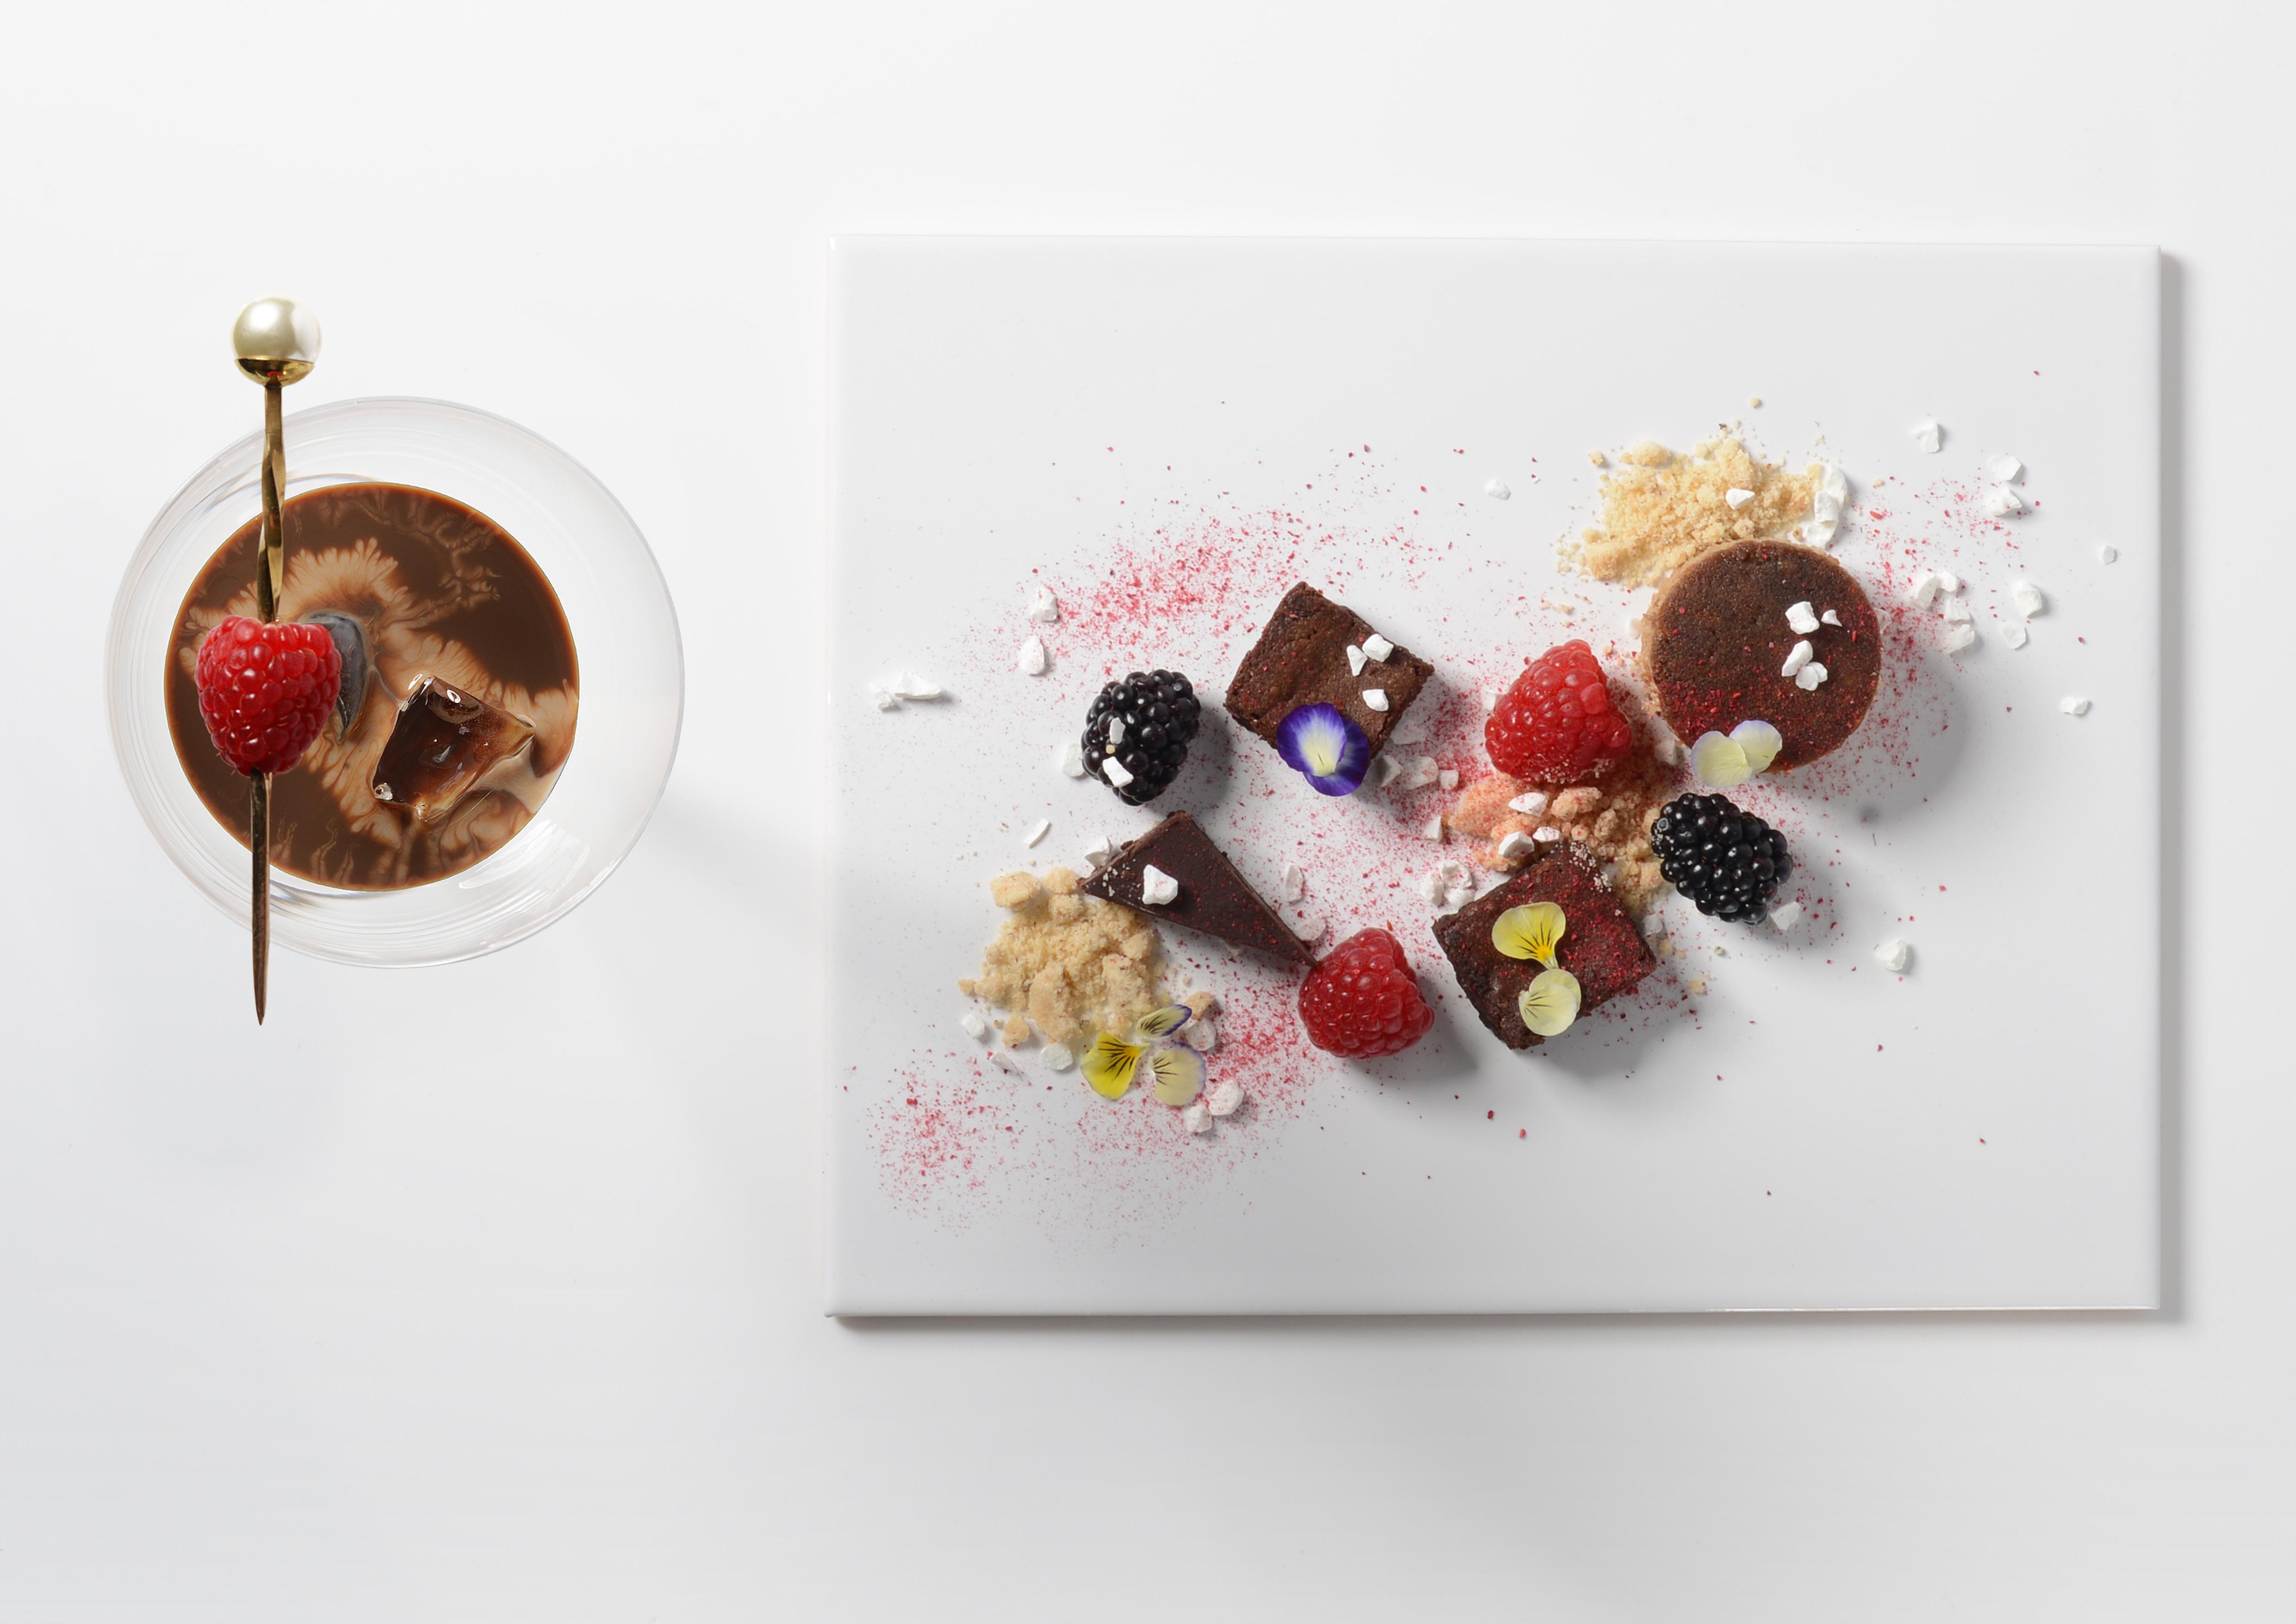 Bar_Chocolat_dessert